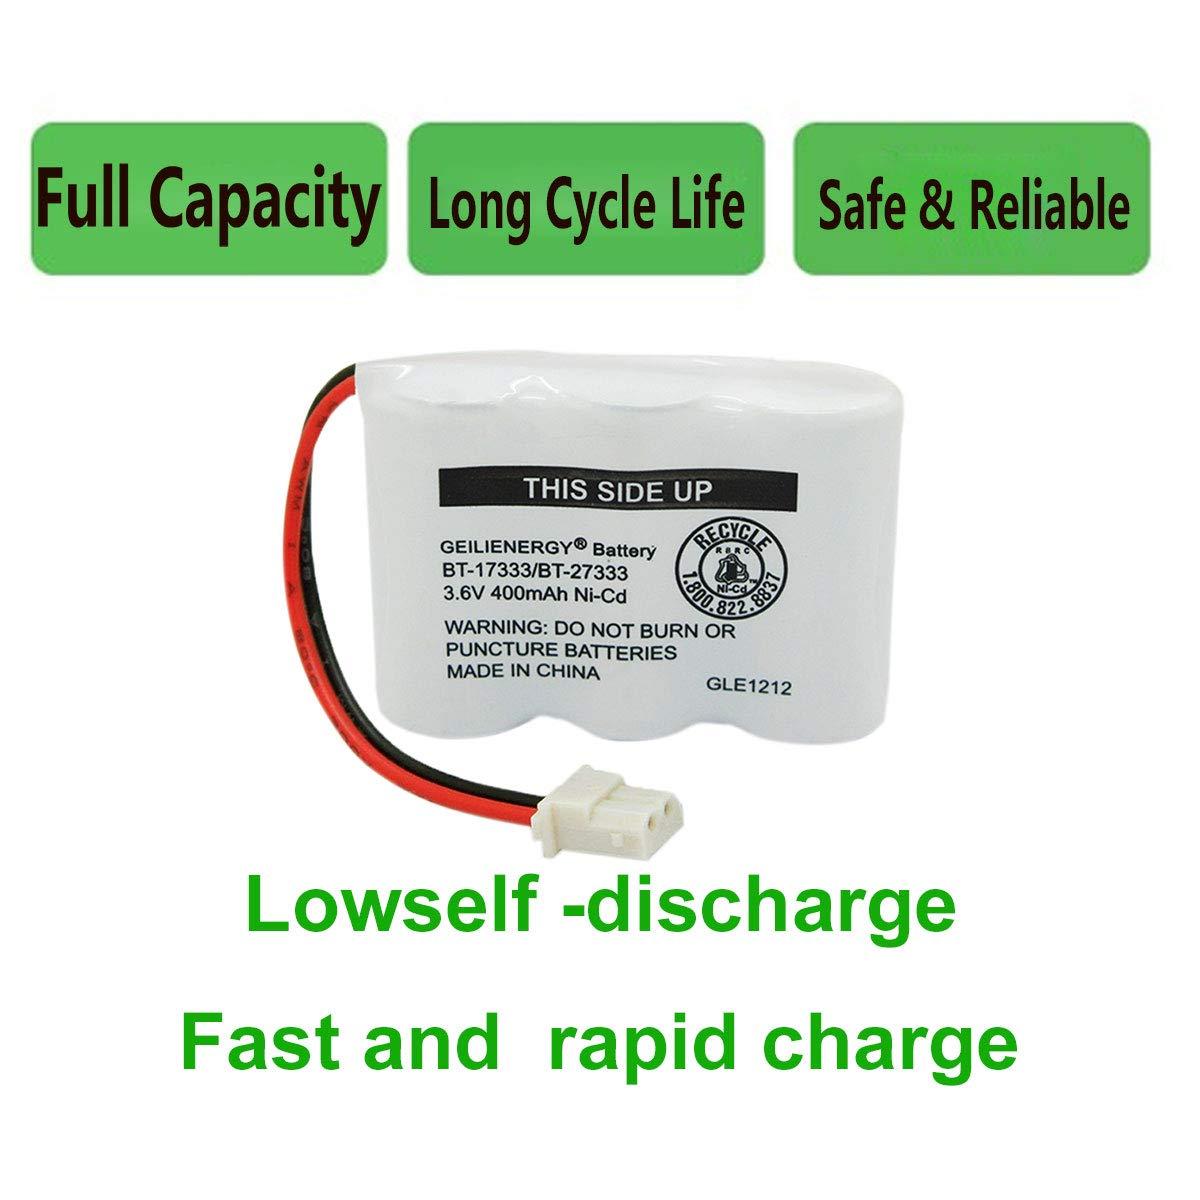 Geilienergy 3.6v 400mAh Battery Compatible with Vtech BT-17333 CS2111 01839 Sanyo CLT3500 GESPCH06 Radio 43-3215 2//3AA Cordless Phone 1 Pack BT-27333